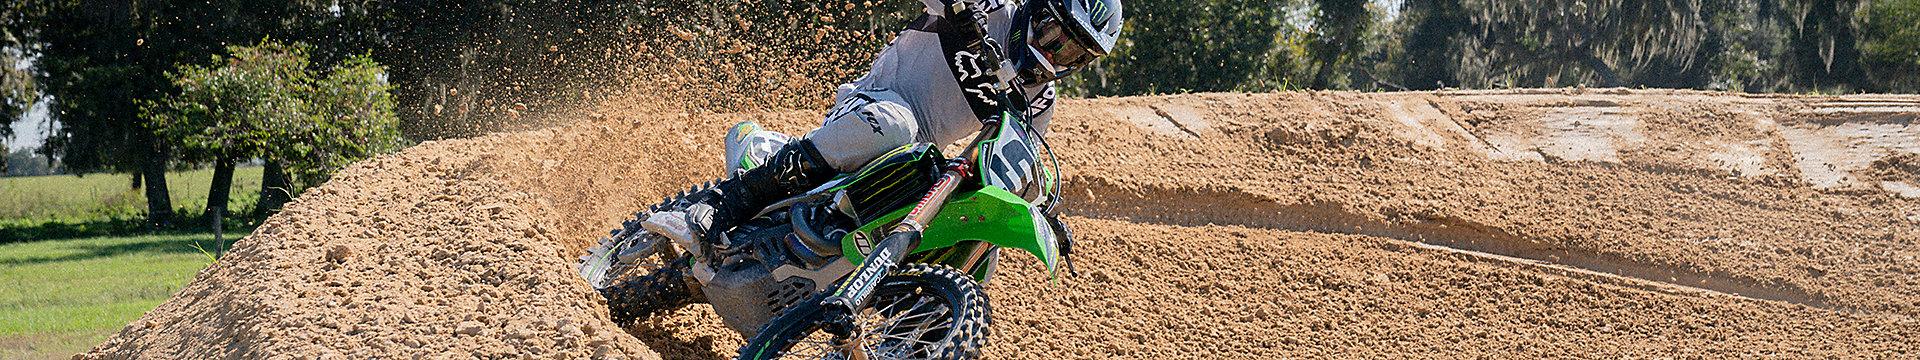 Fox Motocross Stiefel